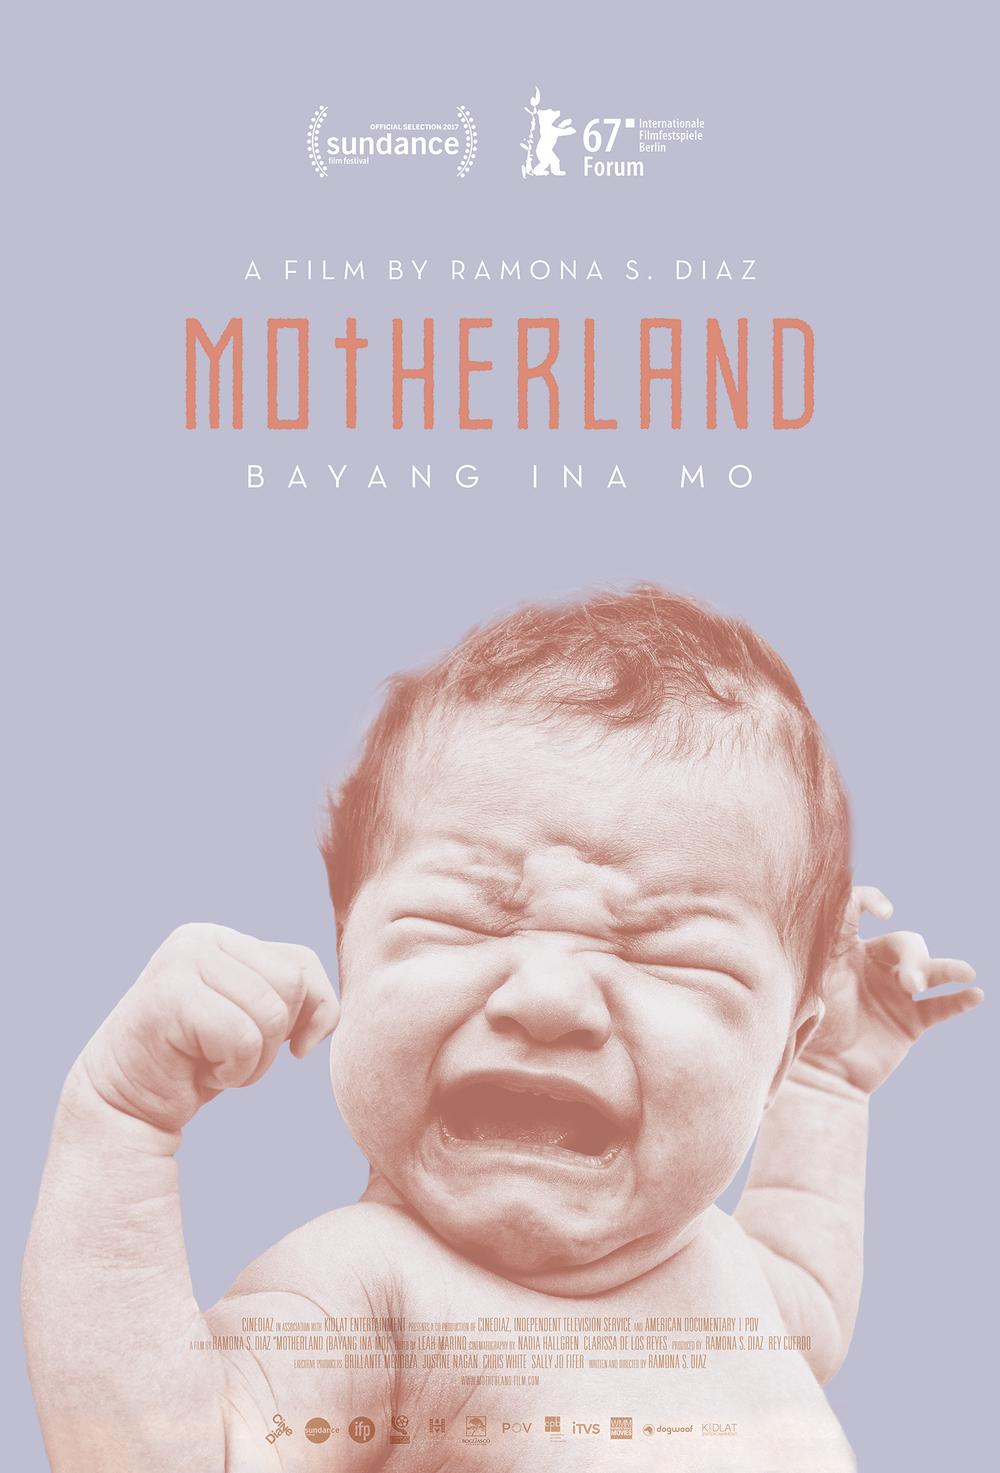 Motherland_Poster_FinalRound_Print_SundanceandBerlinale_web.png